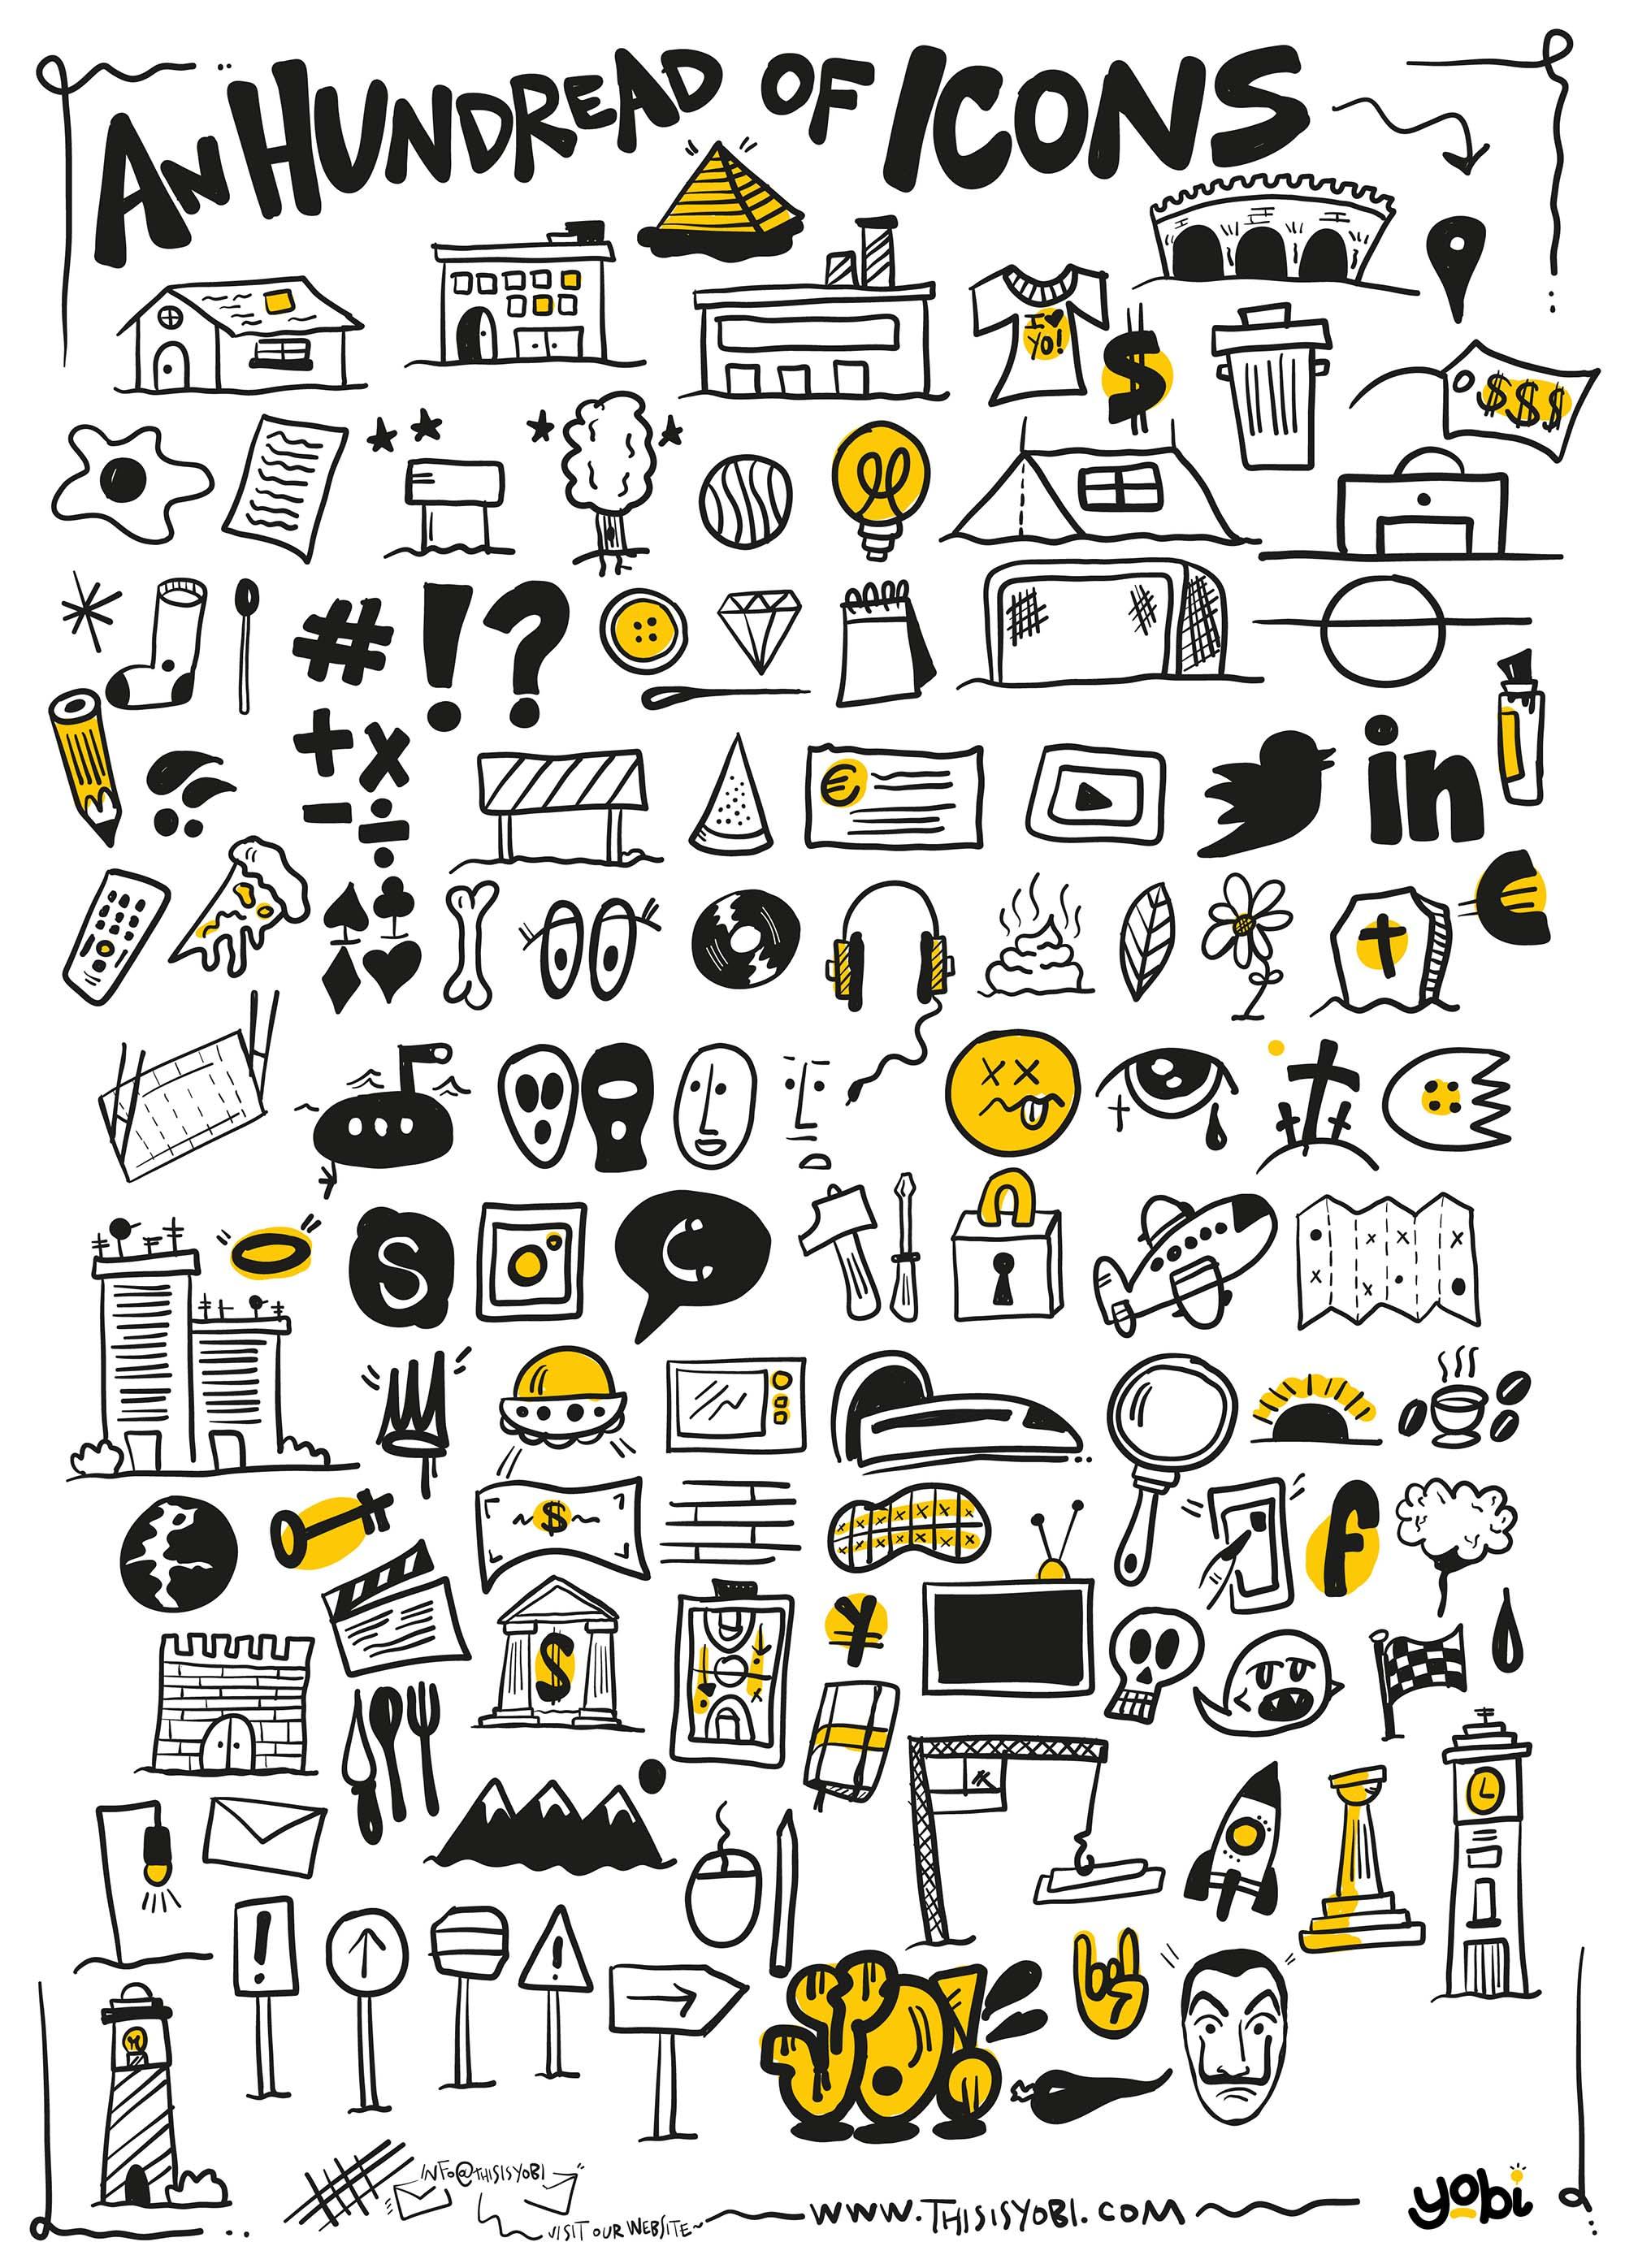 100 Hand-drawn Icons